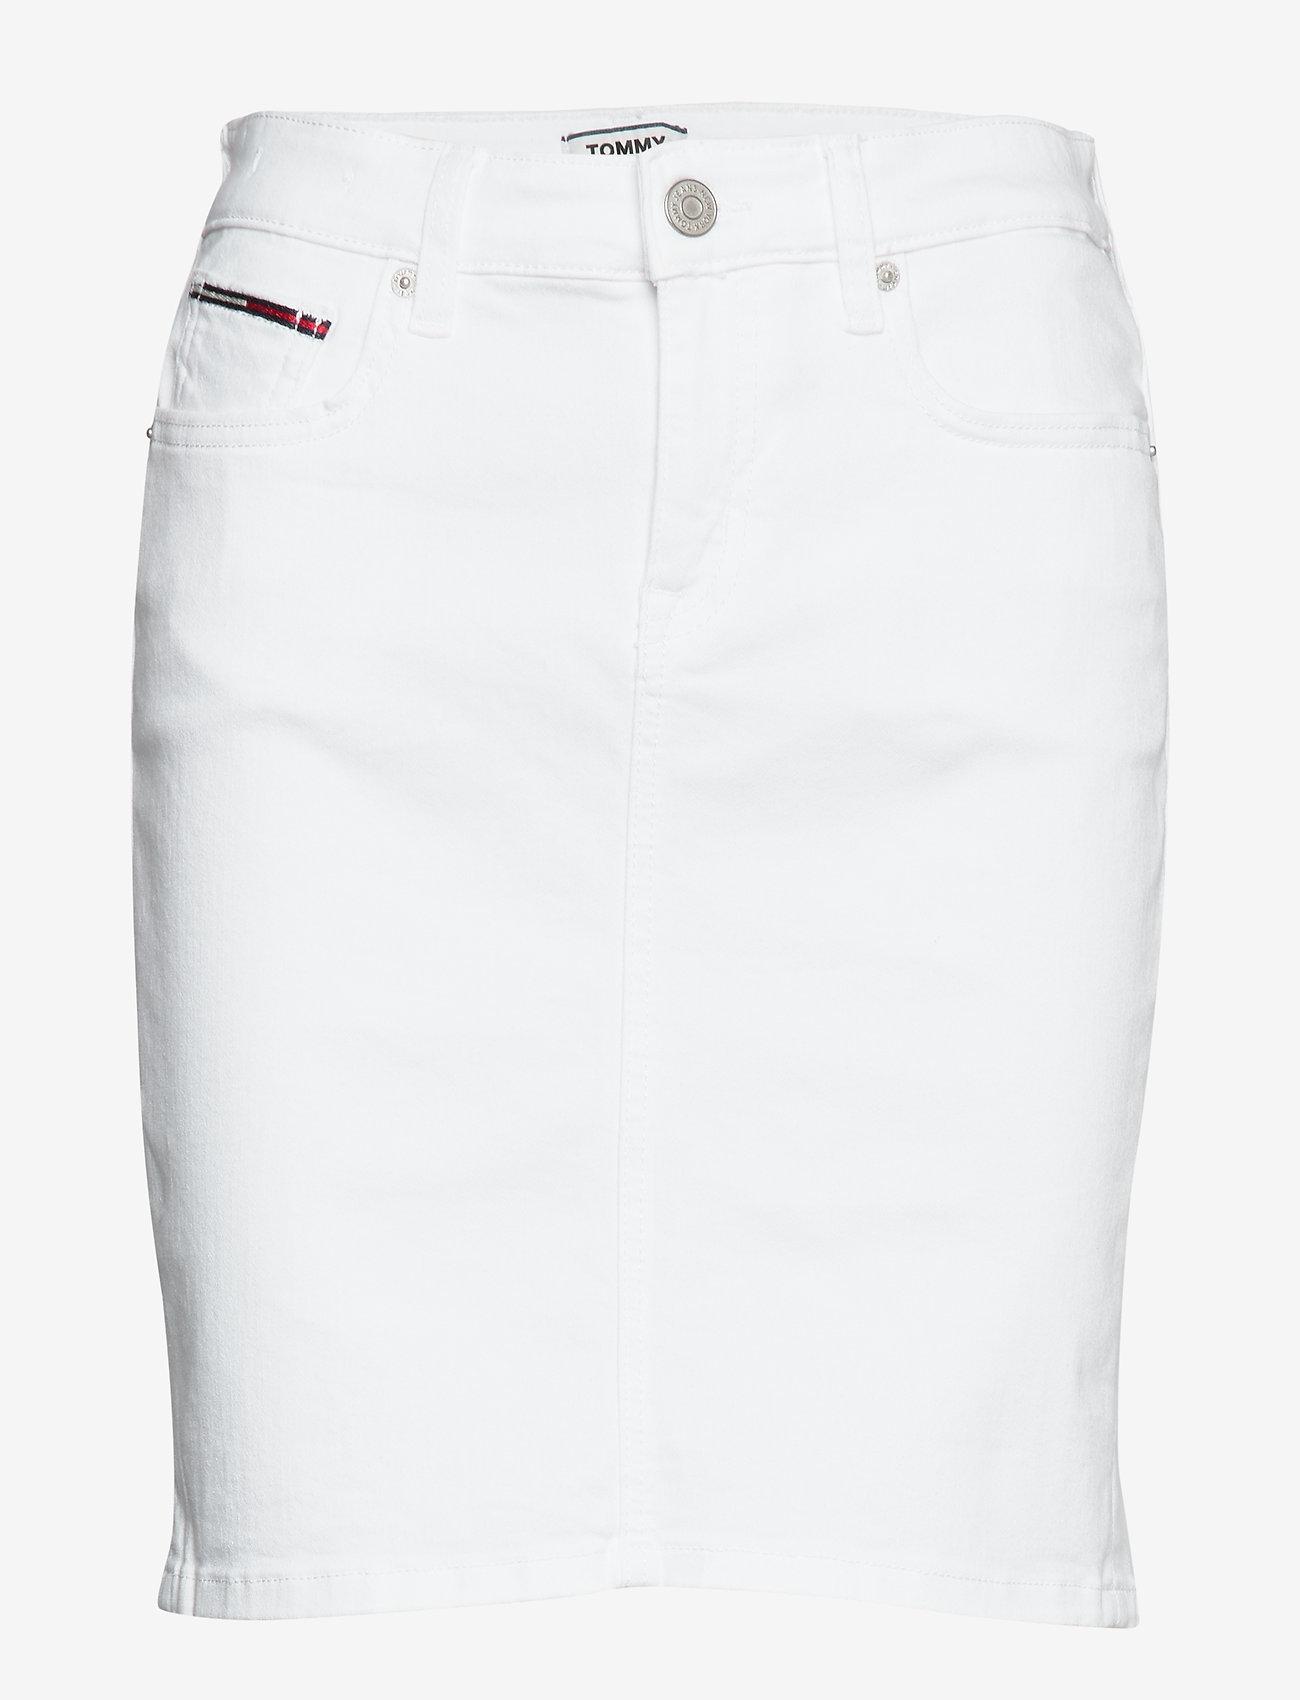 Tommy Jeans - CLASSIC DENIM SKIRT - jupes en jeans - candle white str - 0